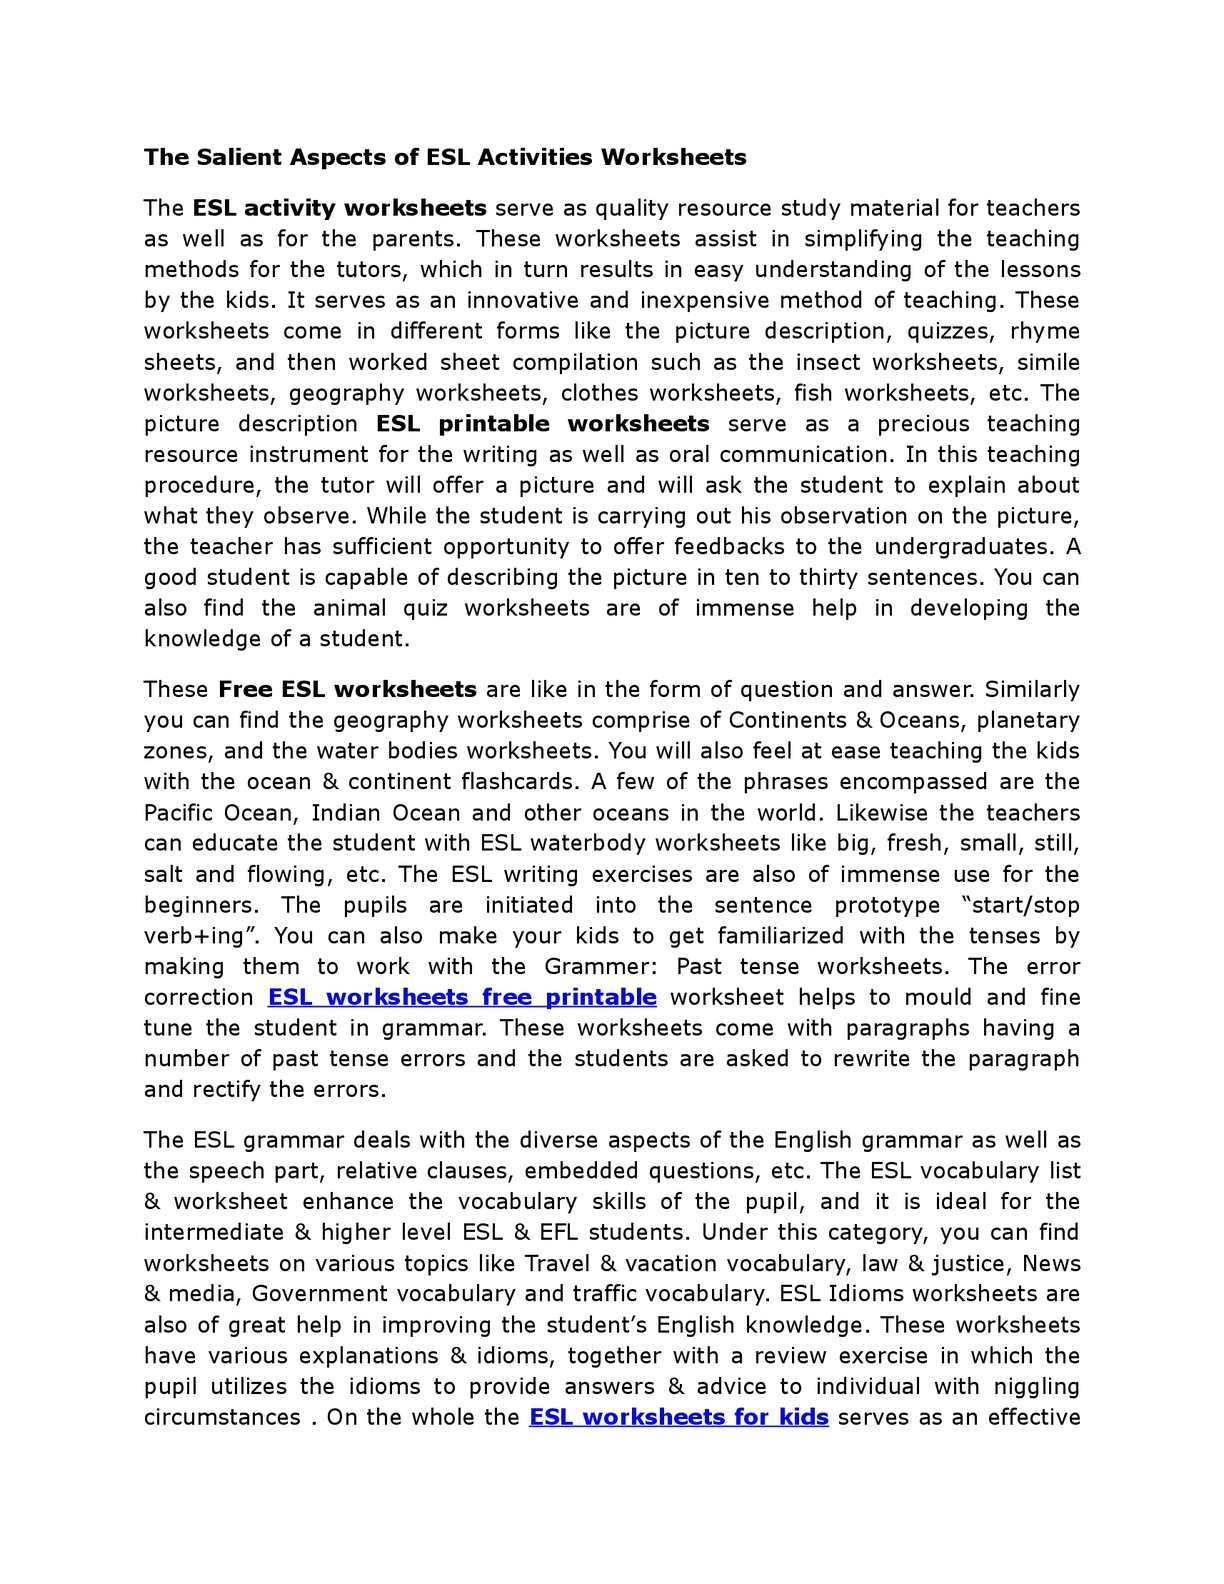 Calamo The Salient Aspects Of Esl Activities Worksheets